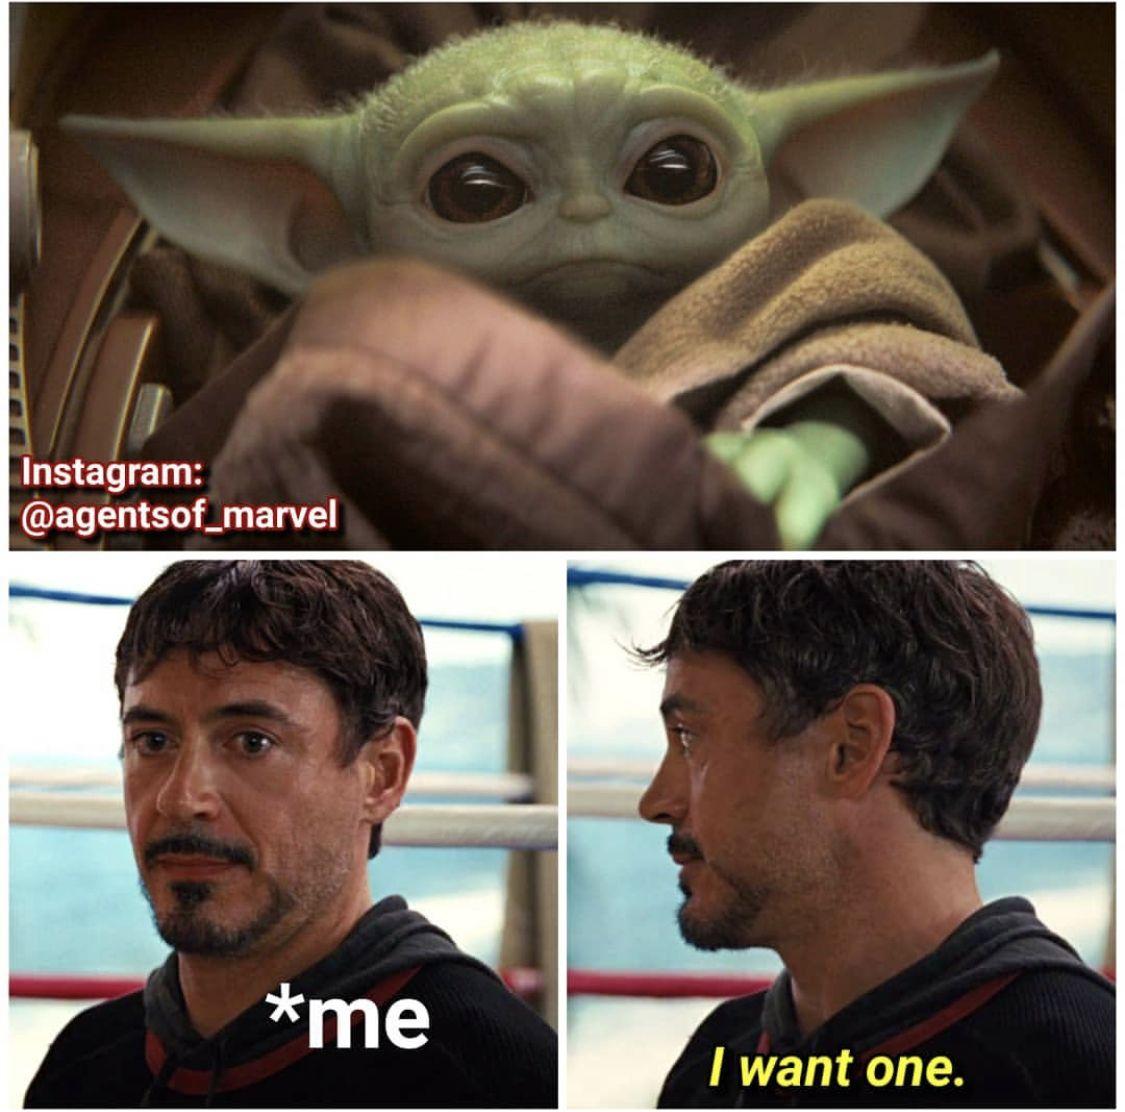 Baby Yoda The Child The Mandalorian Tony Stark Iron Man Star Wars Memes Yoda Meme Funny Star Wars Memes